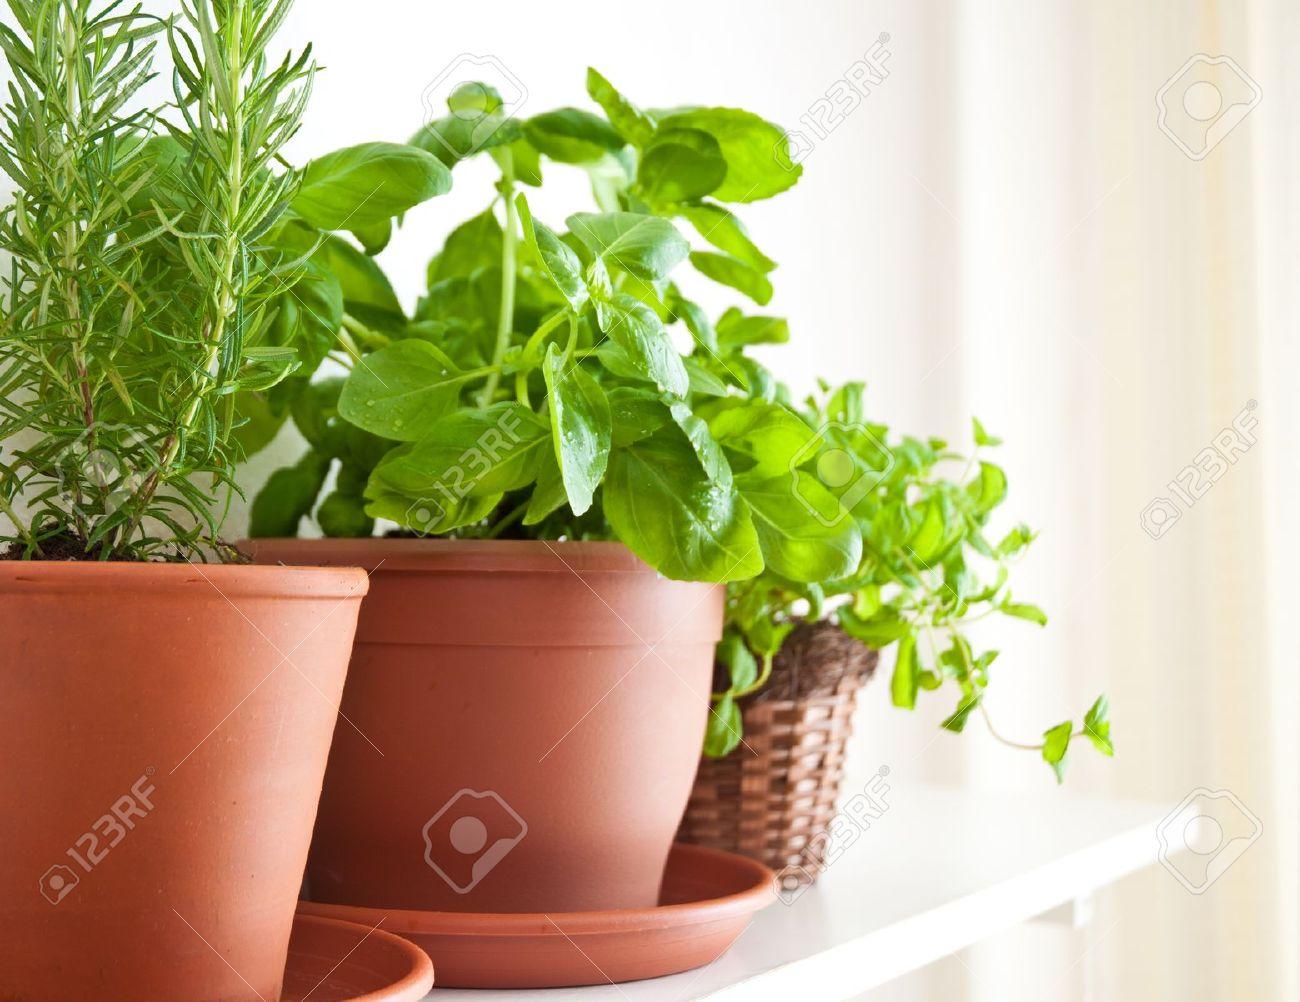 Three pots of herbs: Rosemary, Basil and Mint - 9289906